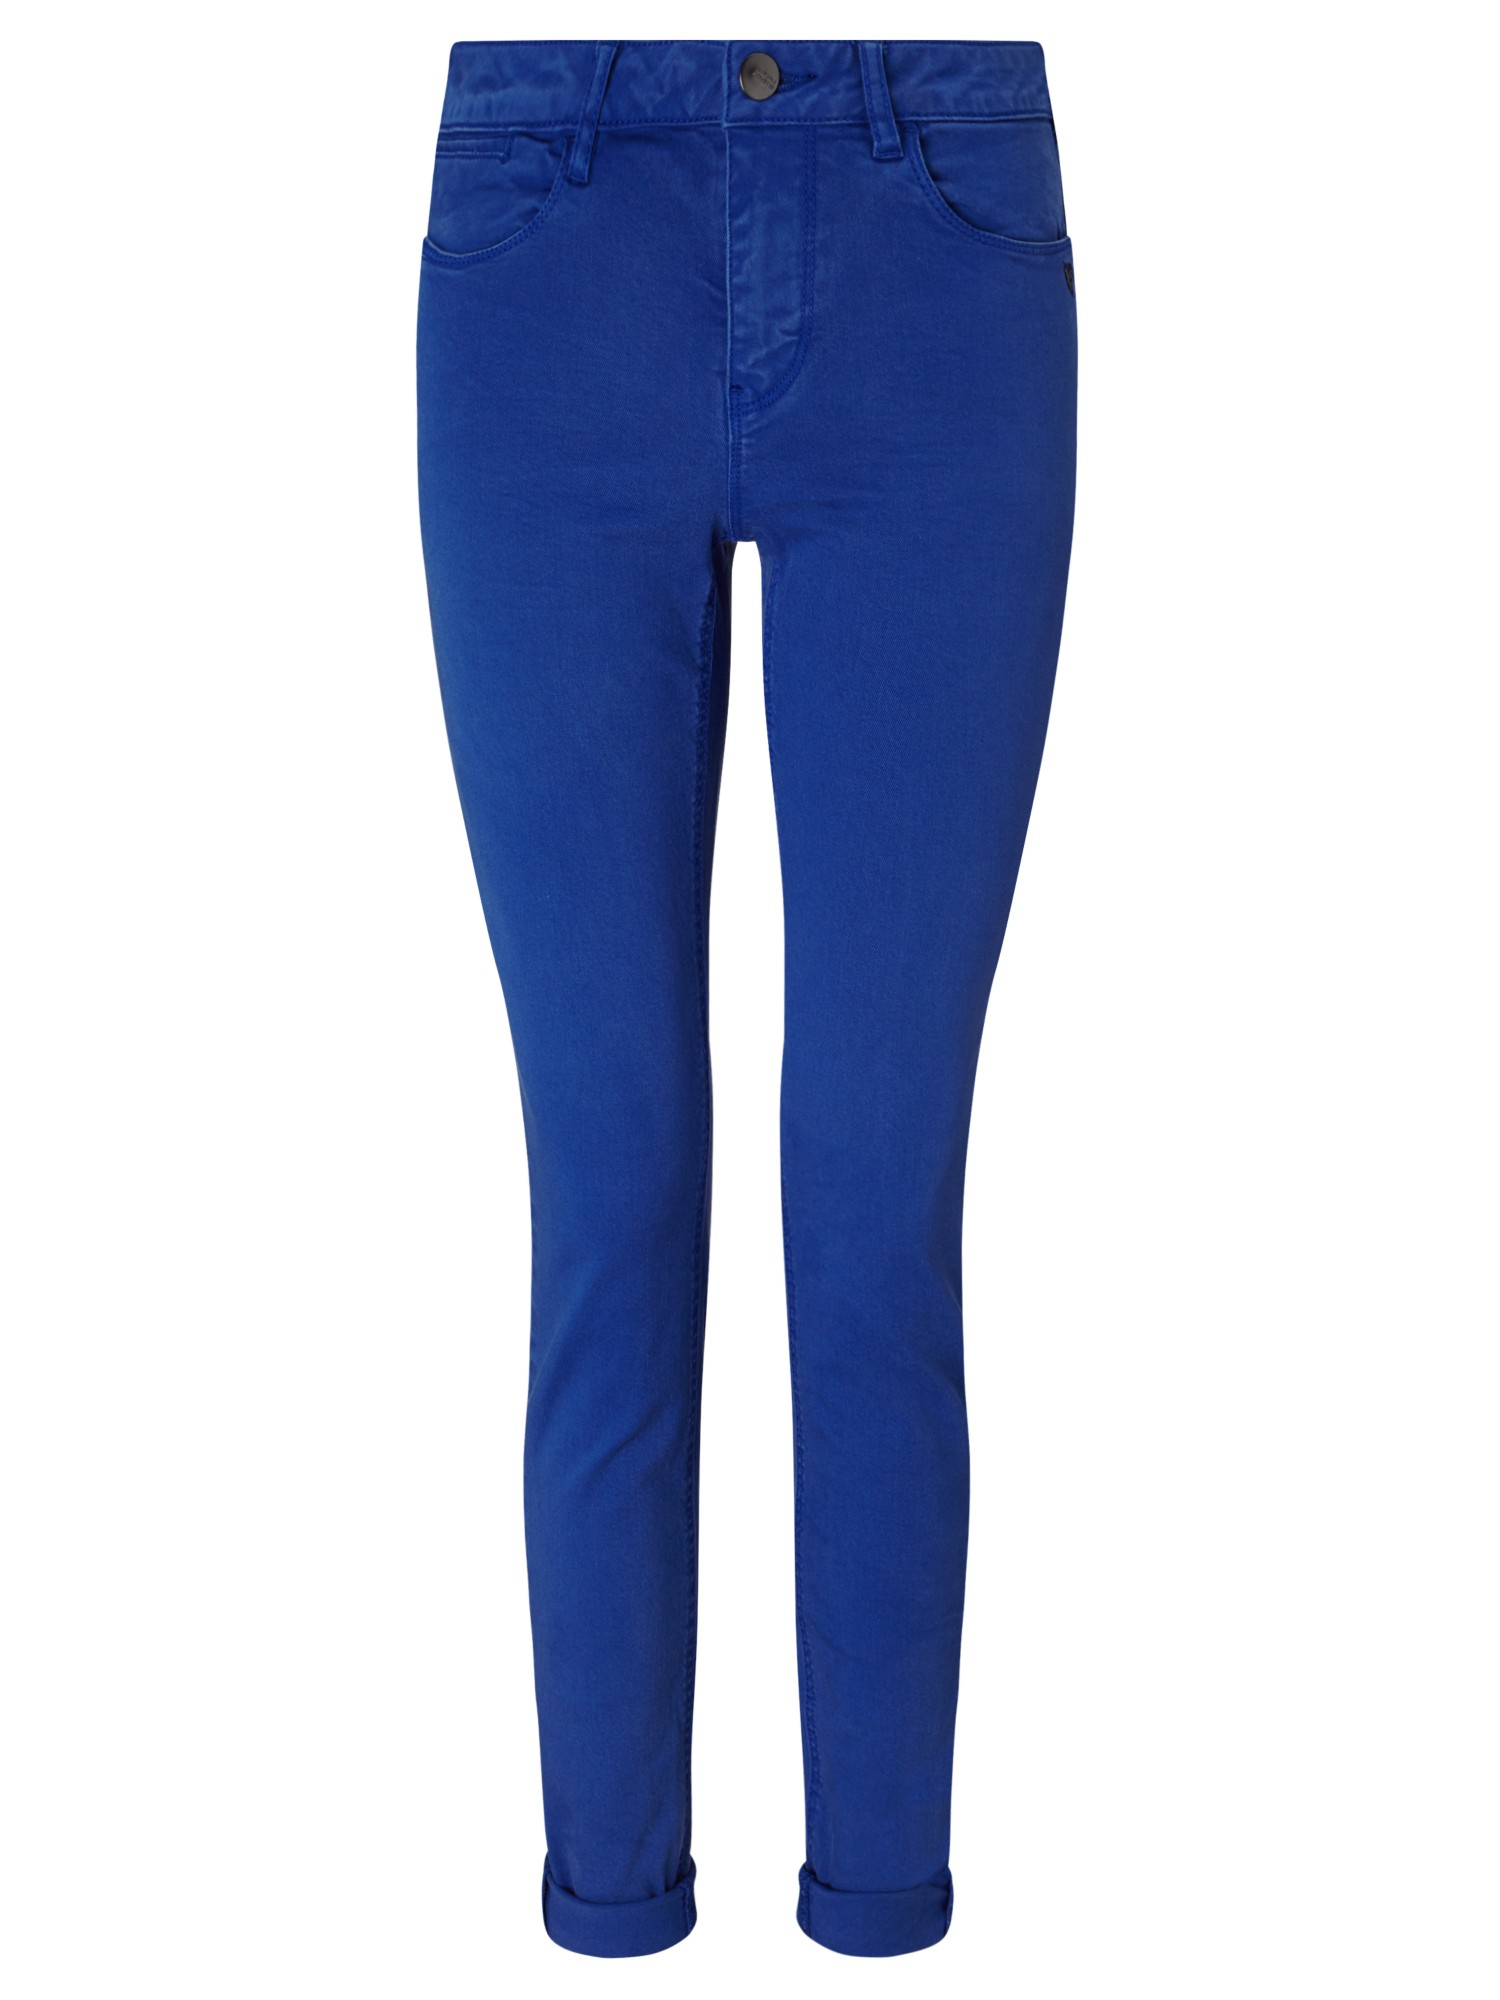 maison scotch la bohemienne skinny jeans in blue lyst. Black Bedroom Furniture Sets. Home Design Ideas